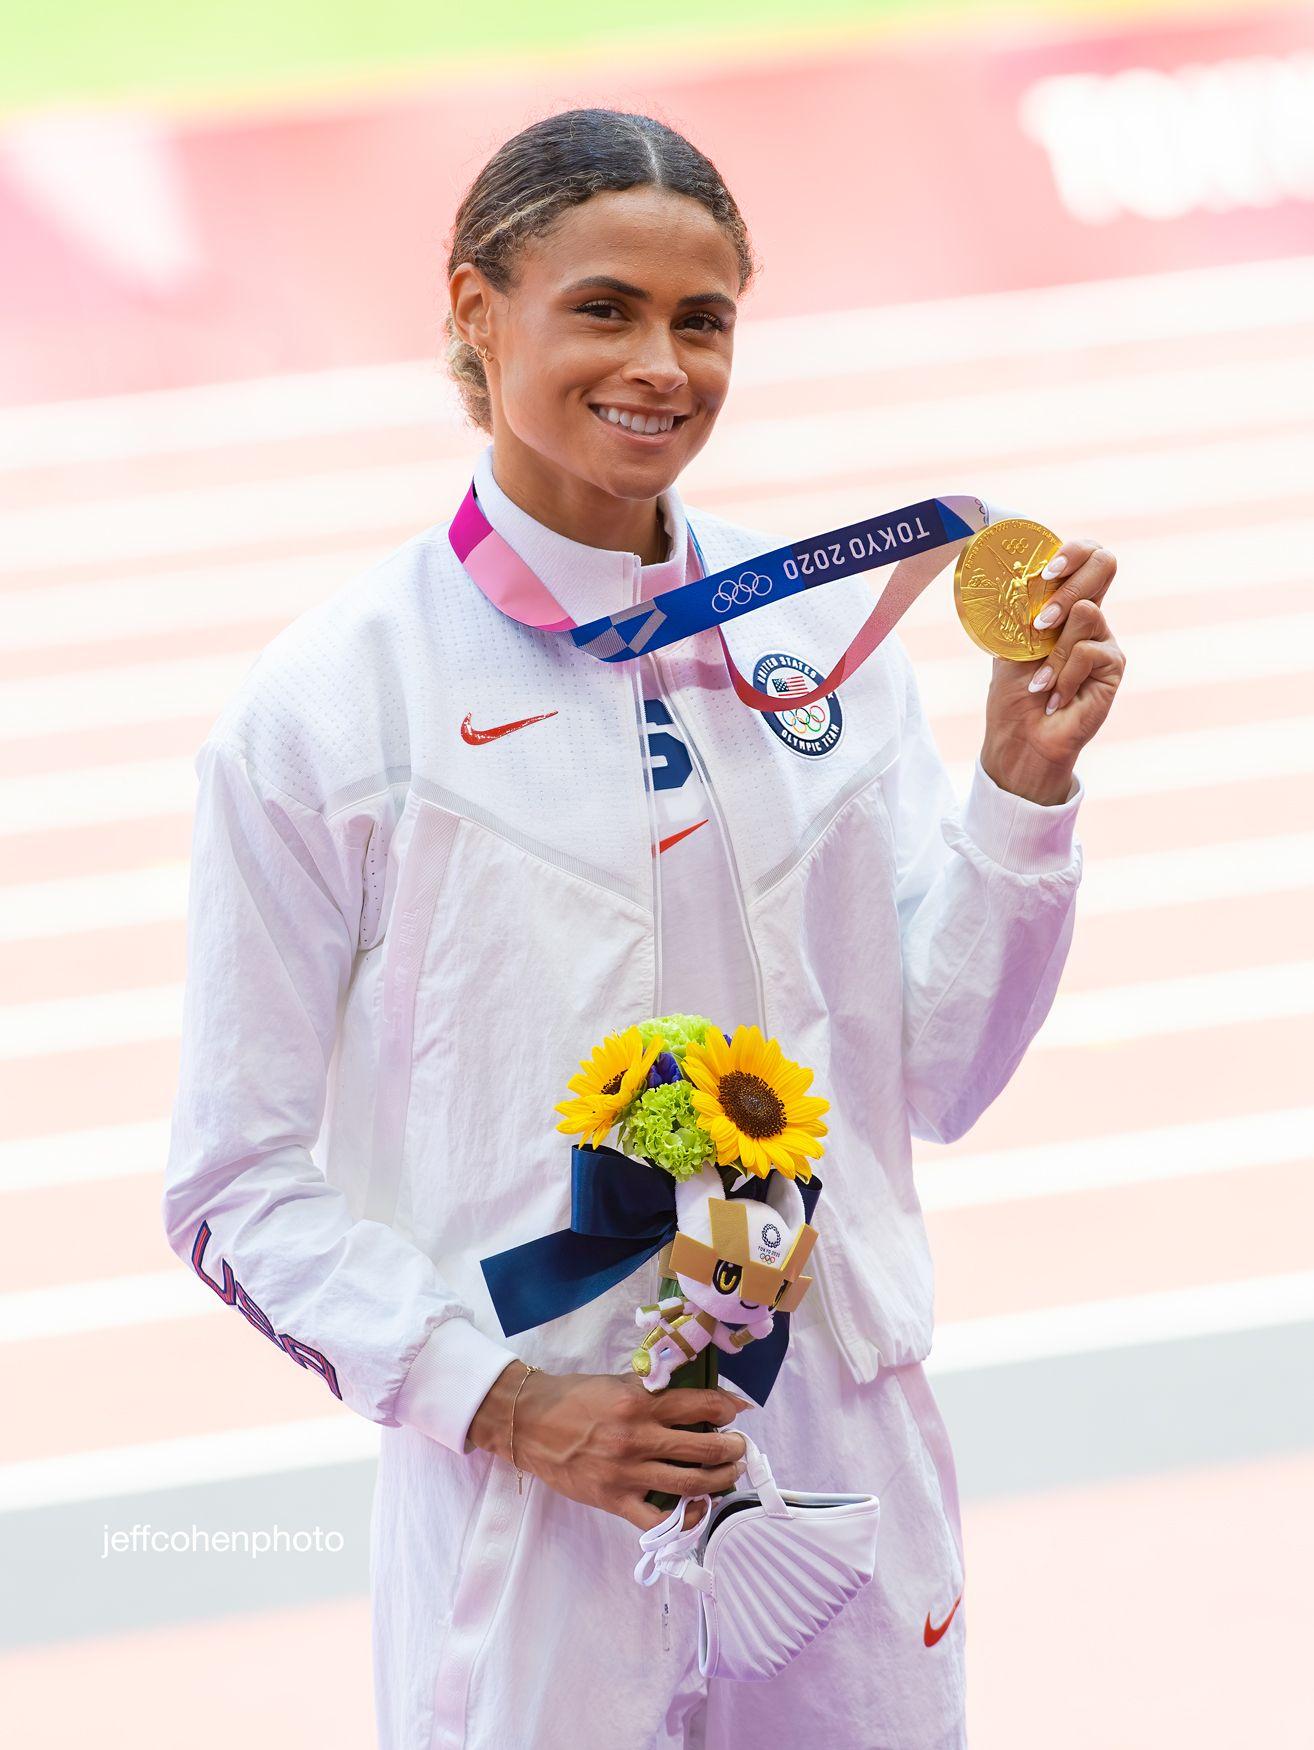 mclaughlin-400hw-medal-2020-tokyo-oly-day-6--night-821-jeff-cohen-photo---copy-web.jpg